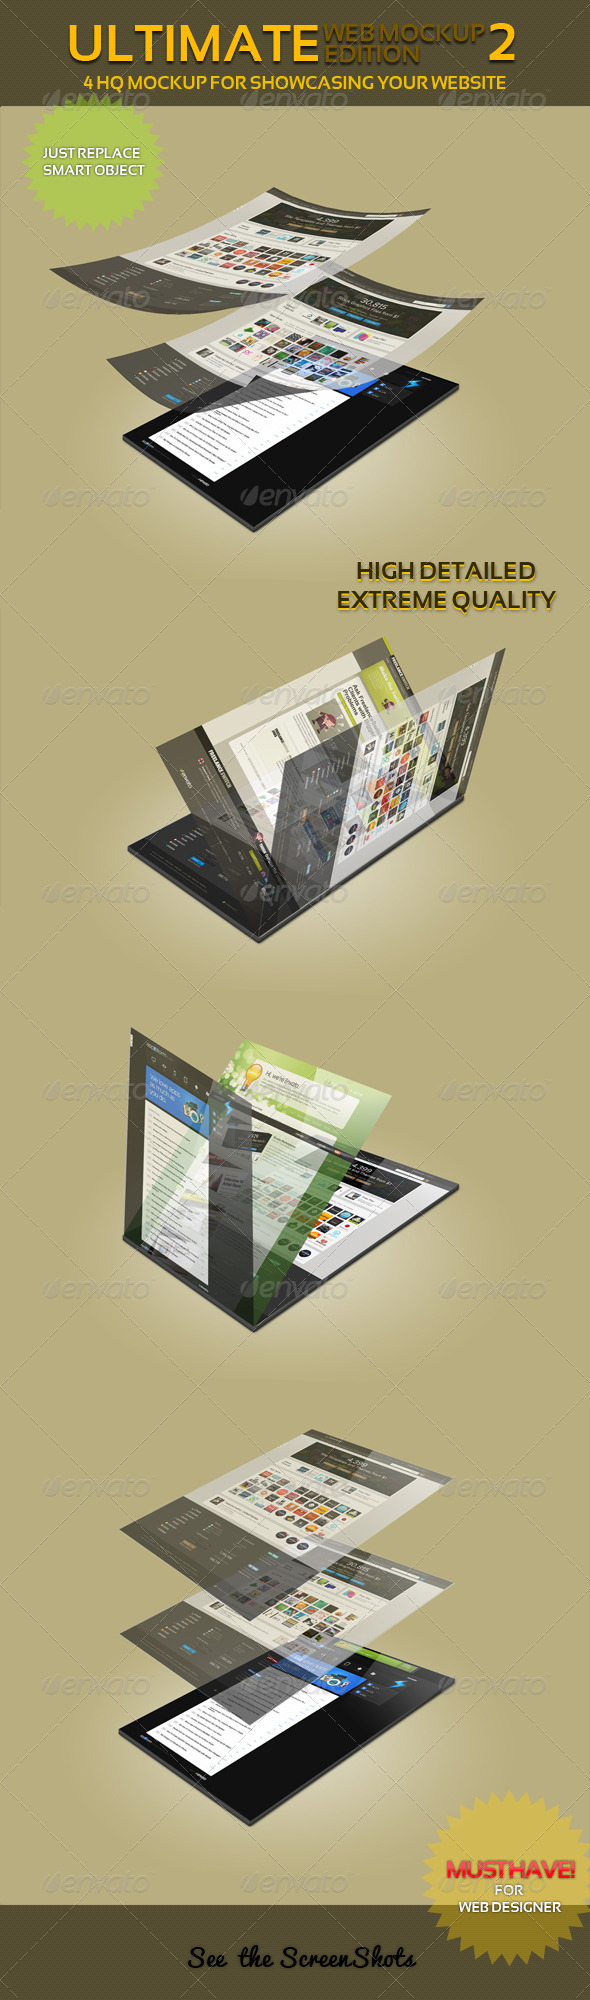 Ultimate Web Mockup Pack 2 - Website Displays